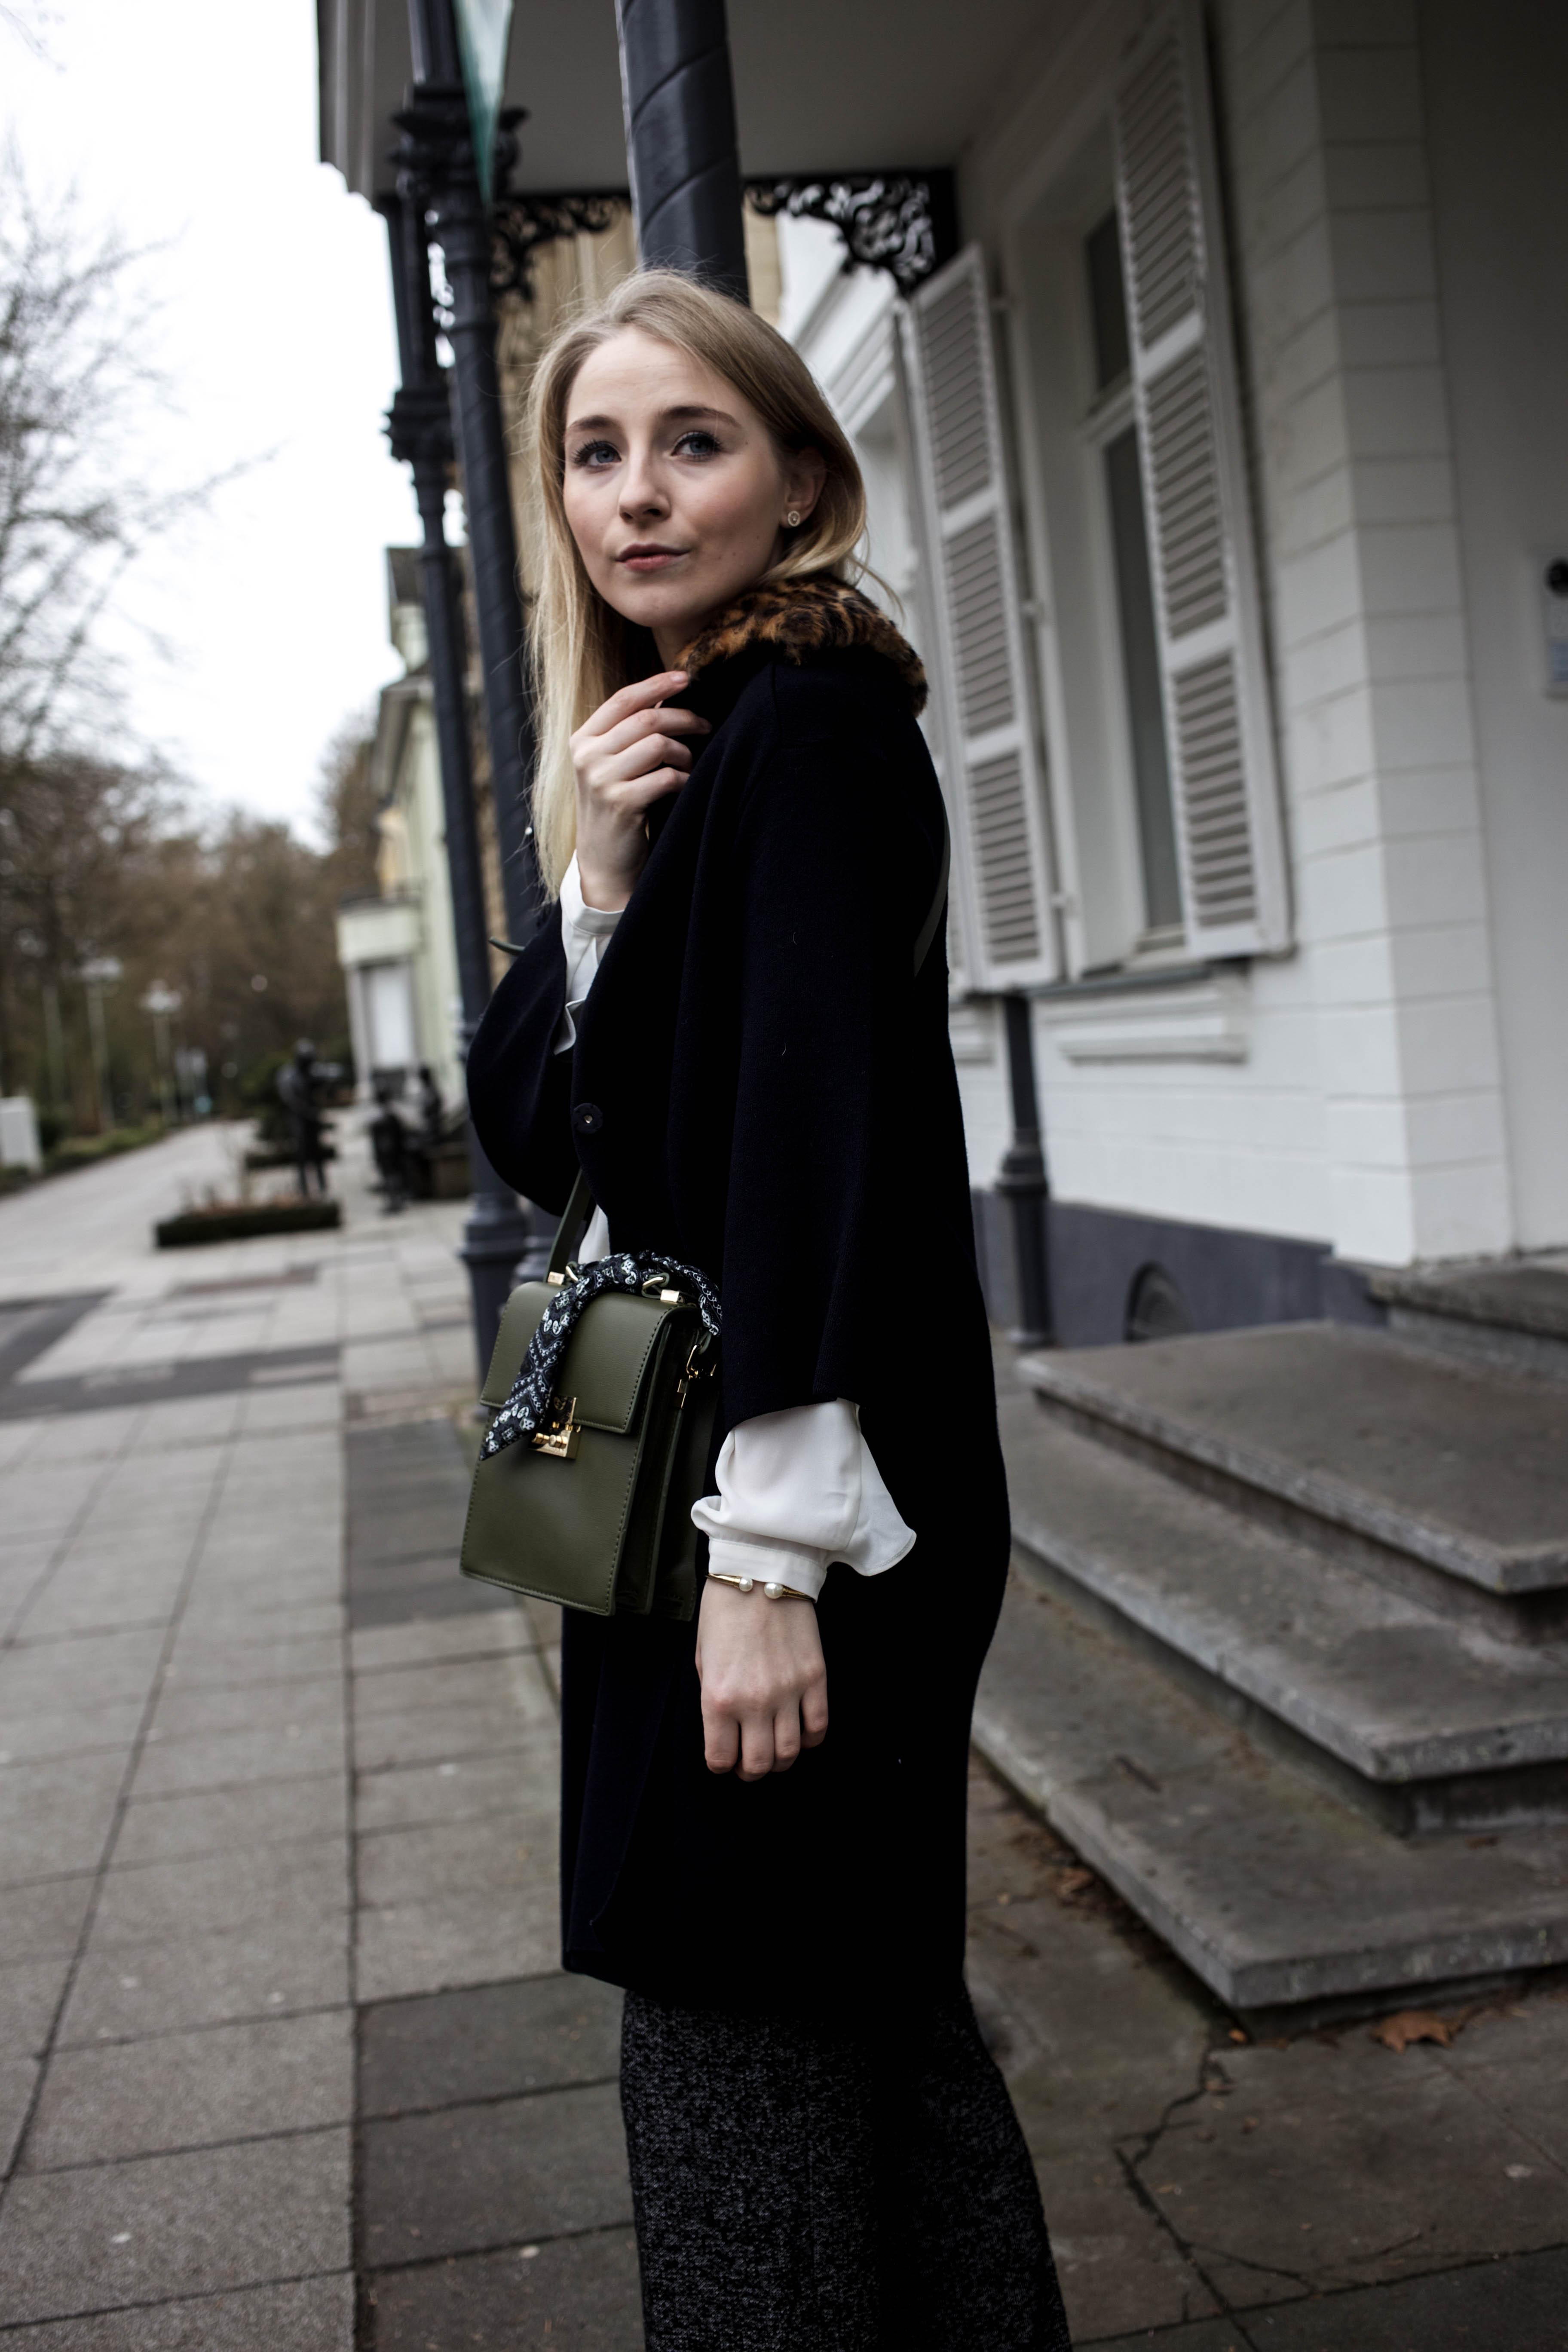 marlenehose-kombinieren-streetstyle-look-modeblog-fashion-blog-cologne-berlin-bonn_0036